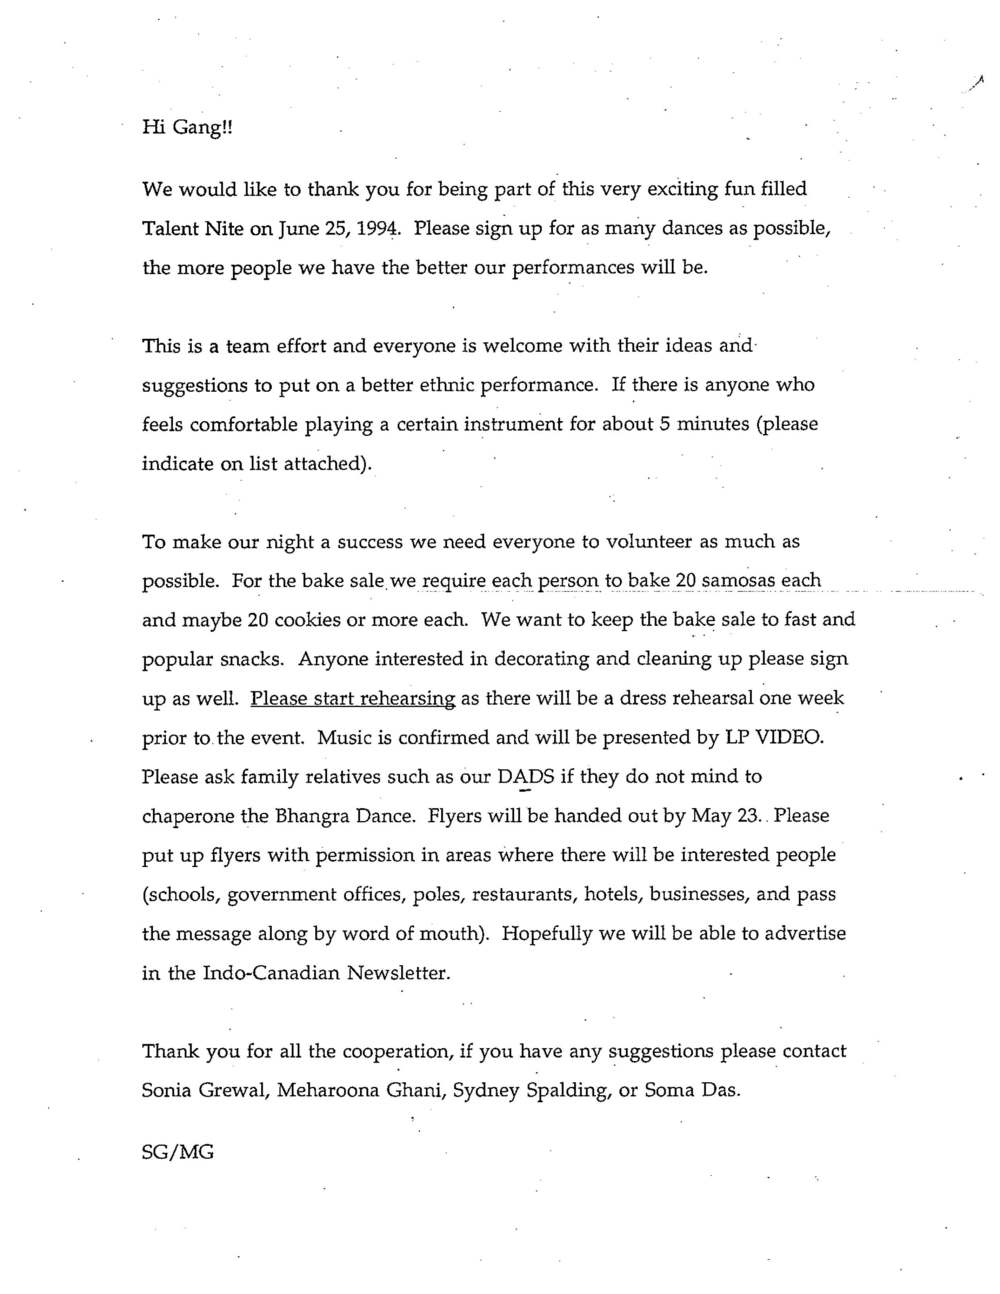 Newsletter 1994_Page_2.jpg